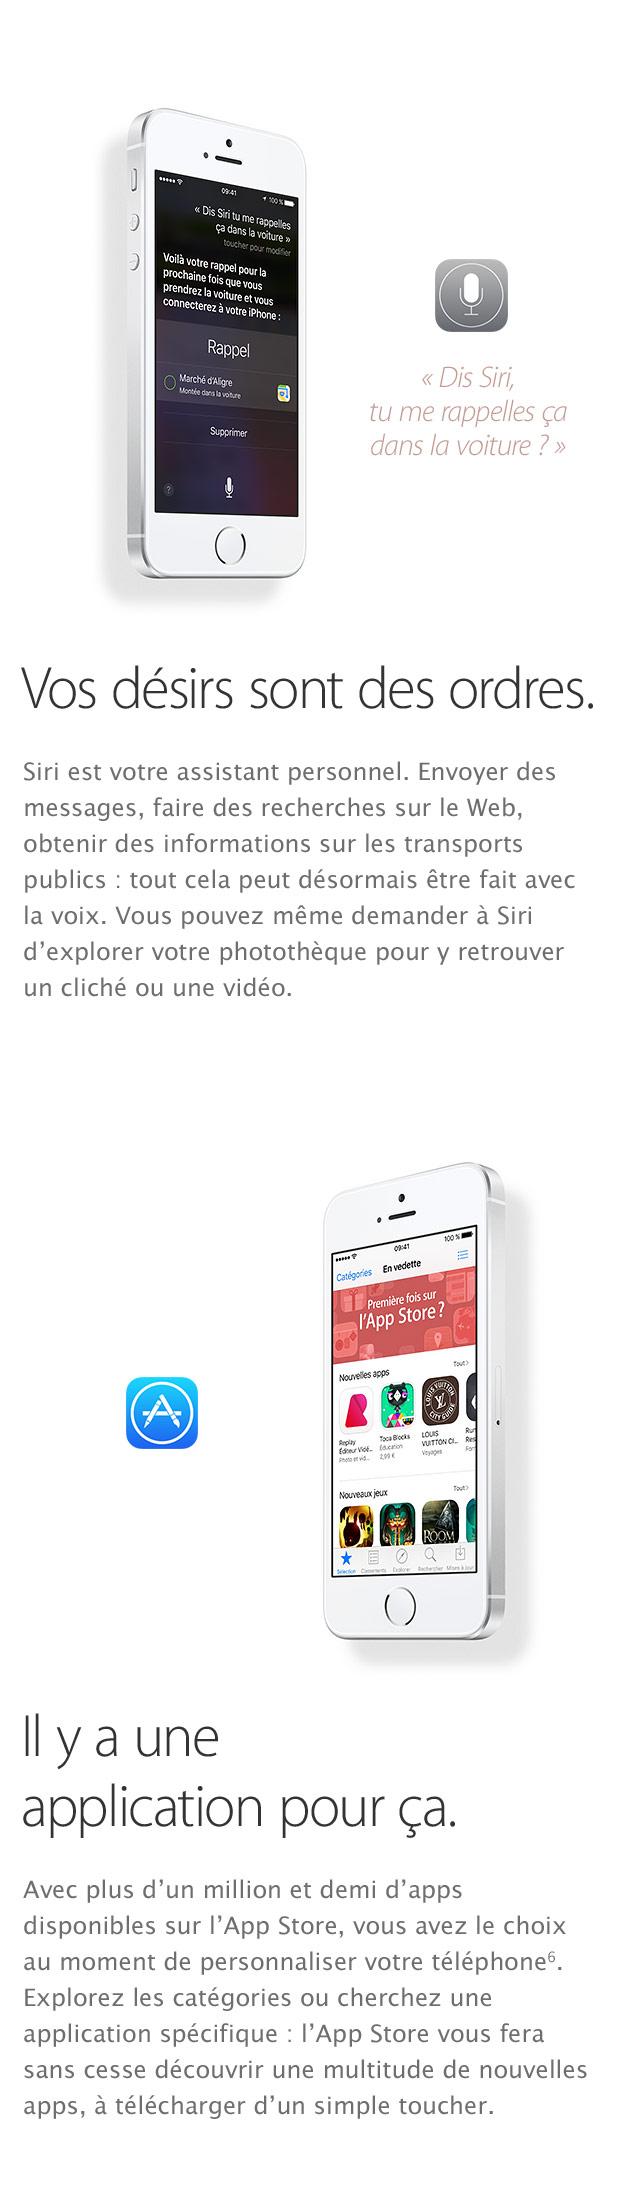 iPhone SE Siri Applications